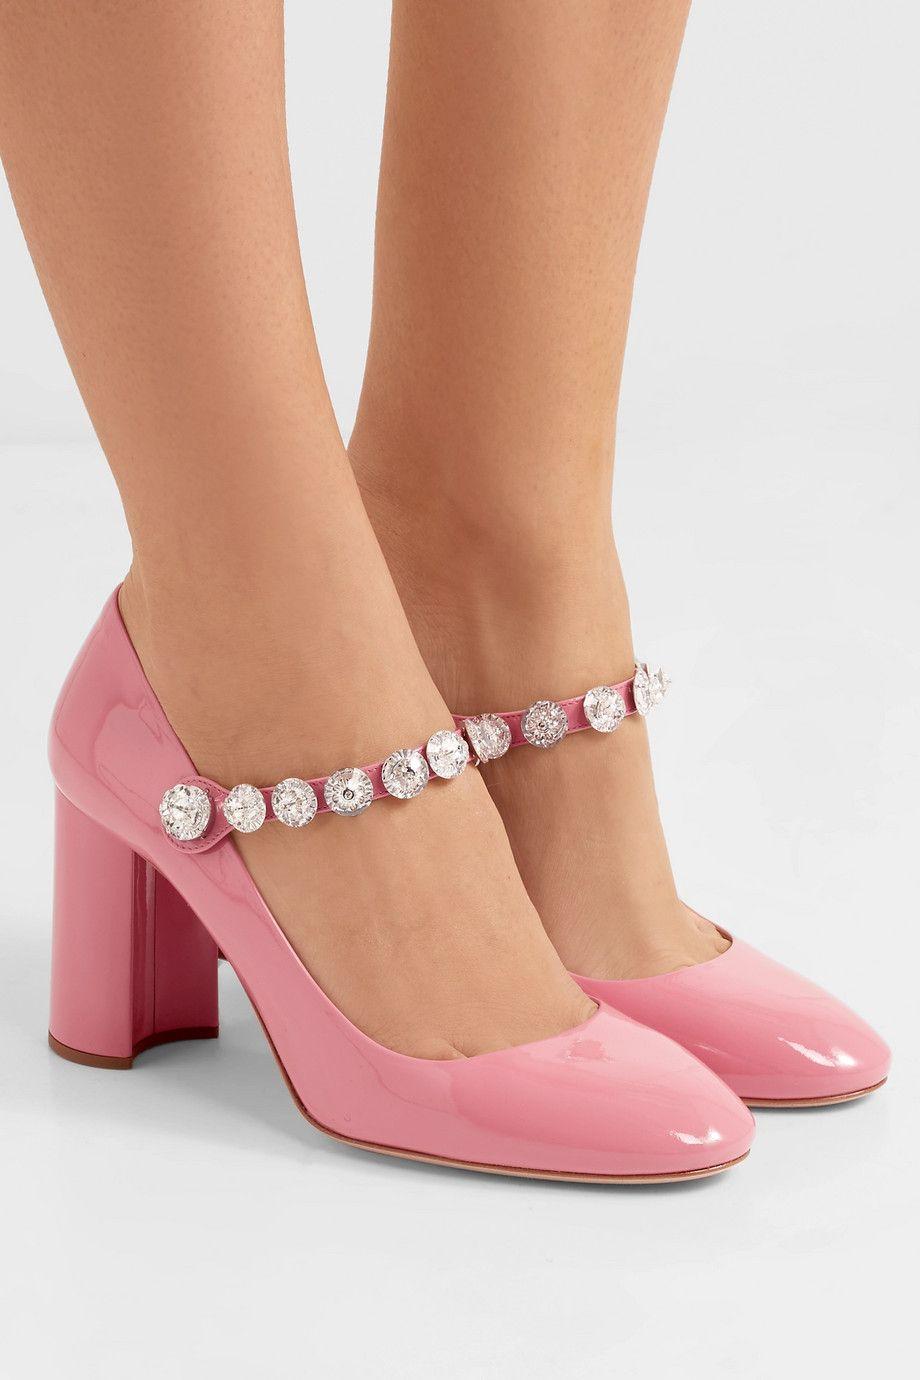 1f065a31cb Miu Miu   Crystal-embellished patent-leather Mary Jane pumps    NET-A-PORTER.COM